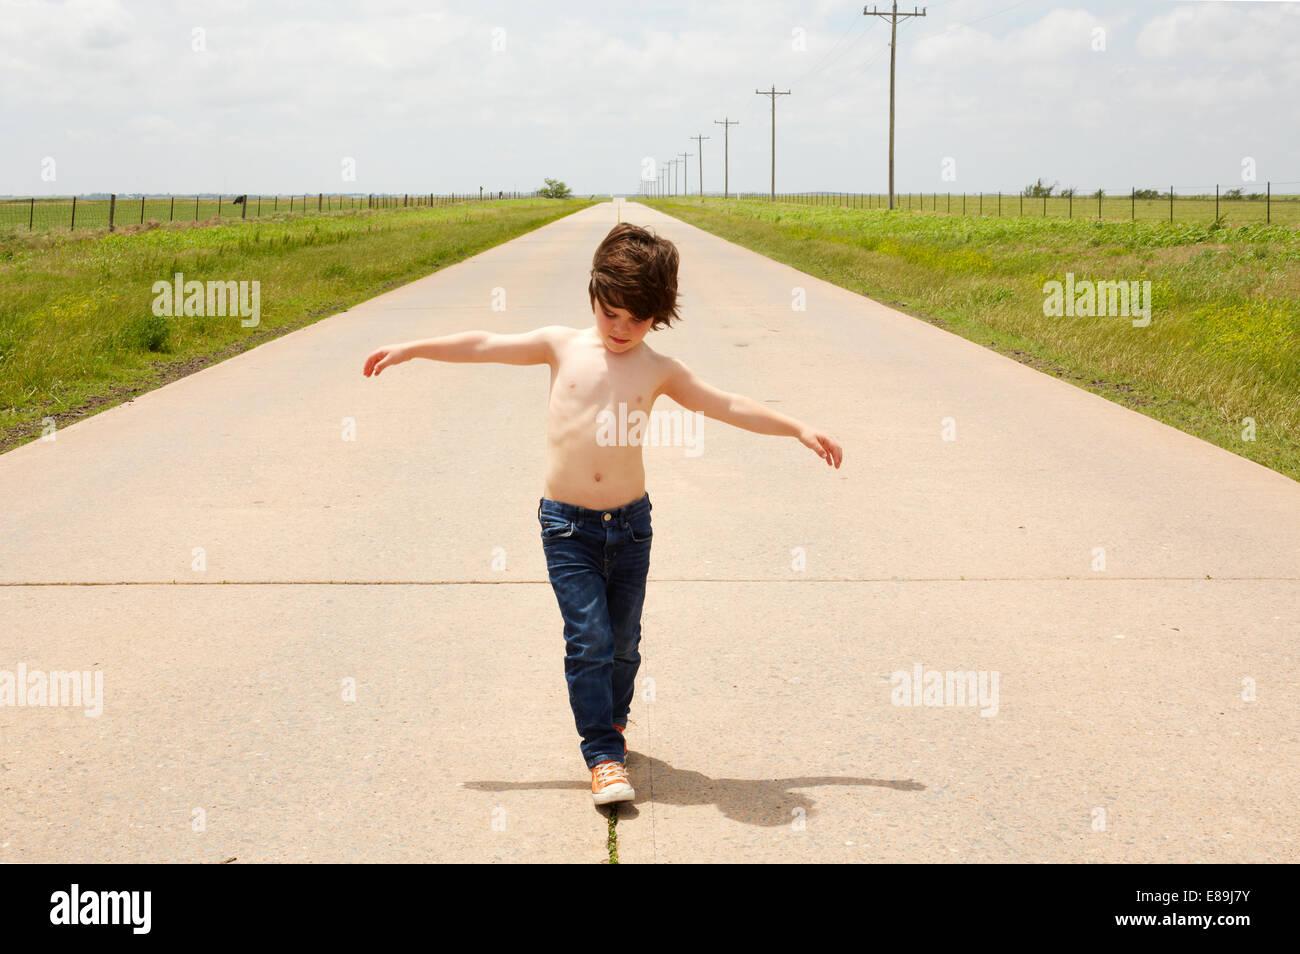 Junge Bürgersteig entlang Stockbild